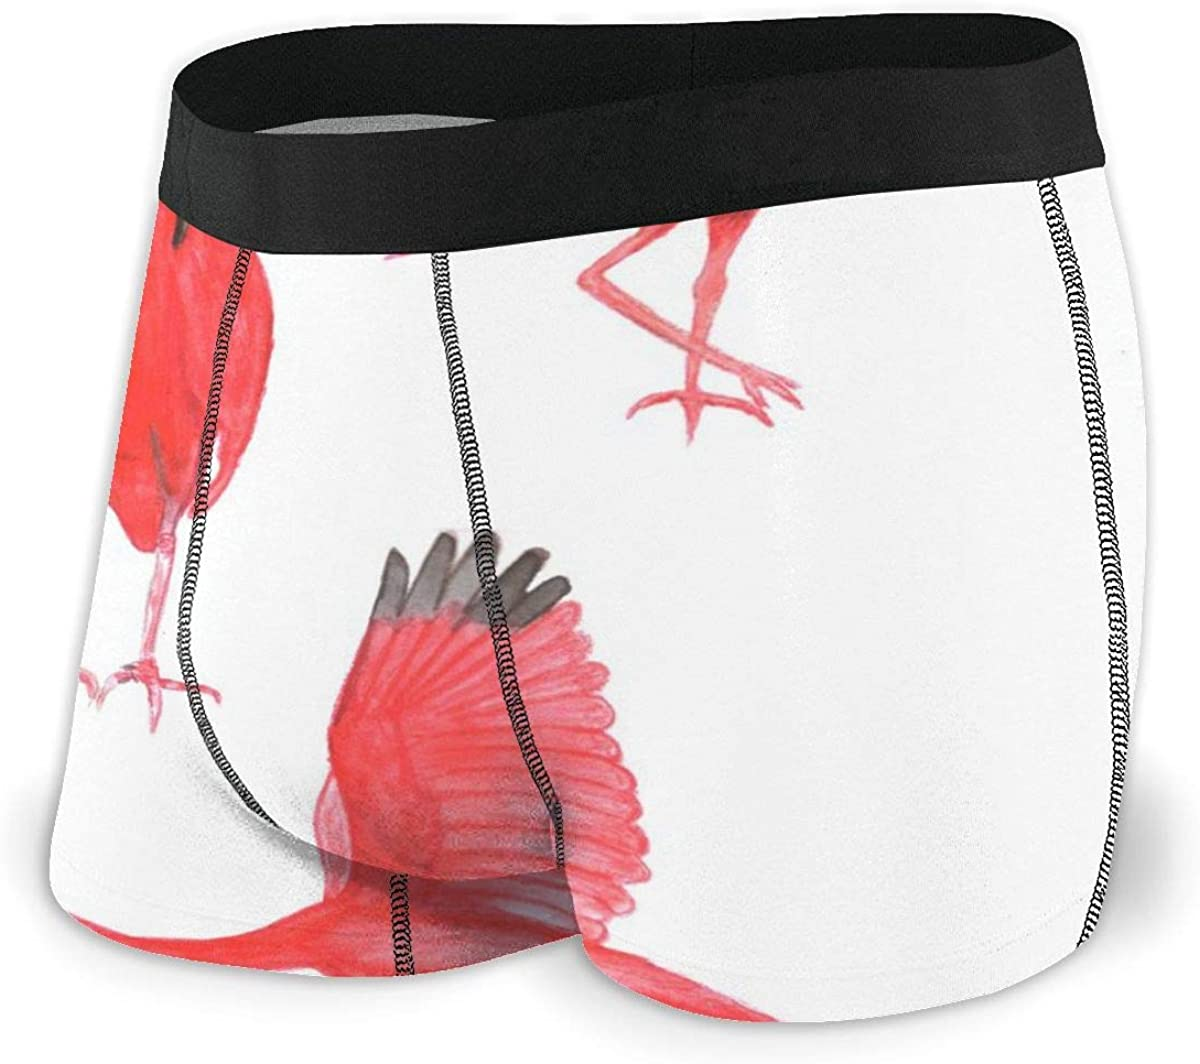 Mens Boxer Briefs Scarlet Ibises Pretty Birds Boys Trunks Underwear Short Leg Breathable Man